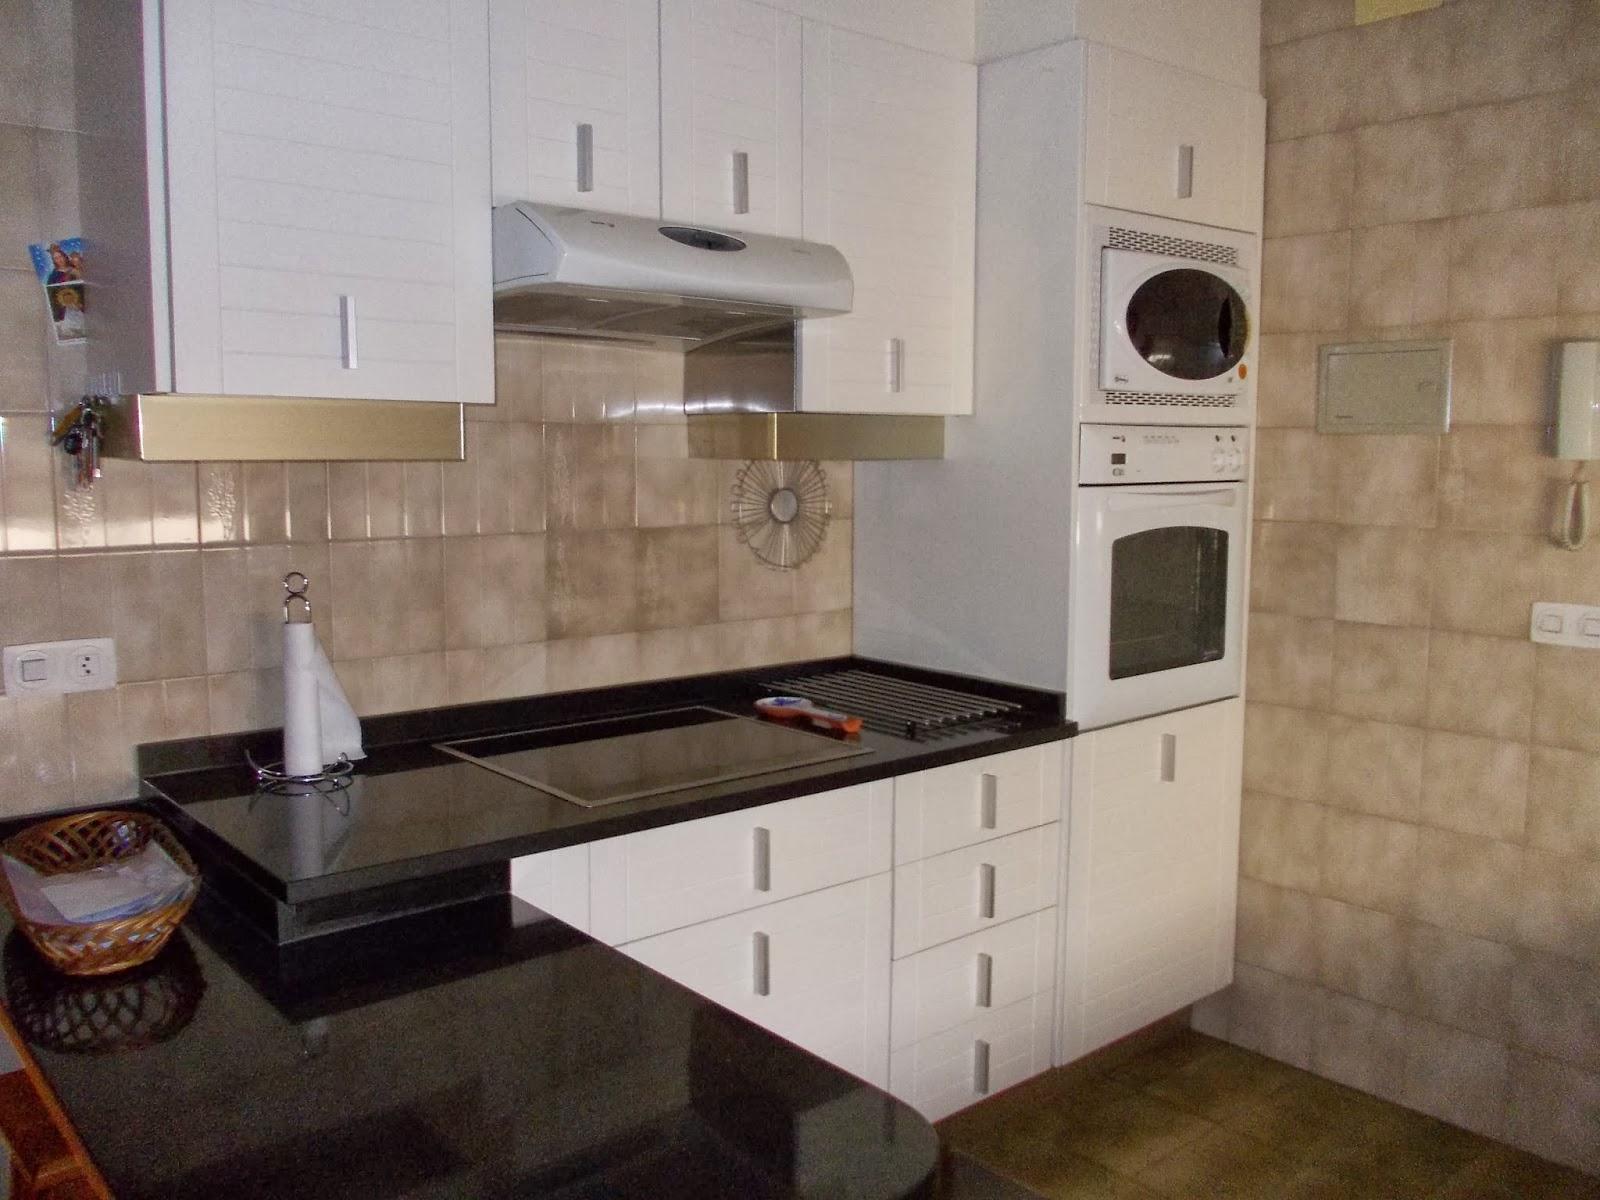 Inmobiliaria mart nez nogueira venta piso vp13 361 zona for Alquiler pisos a valenza